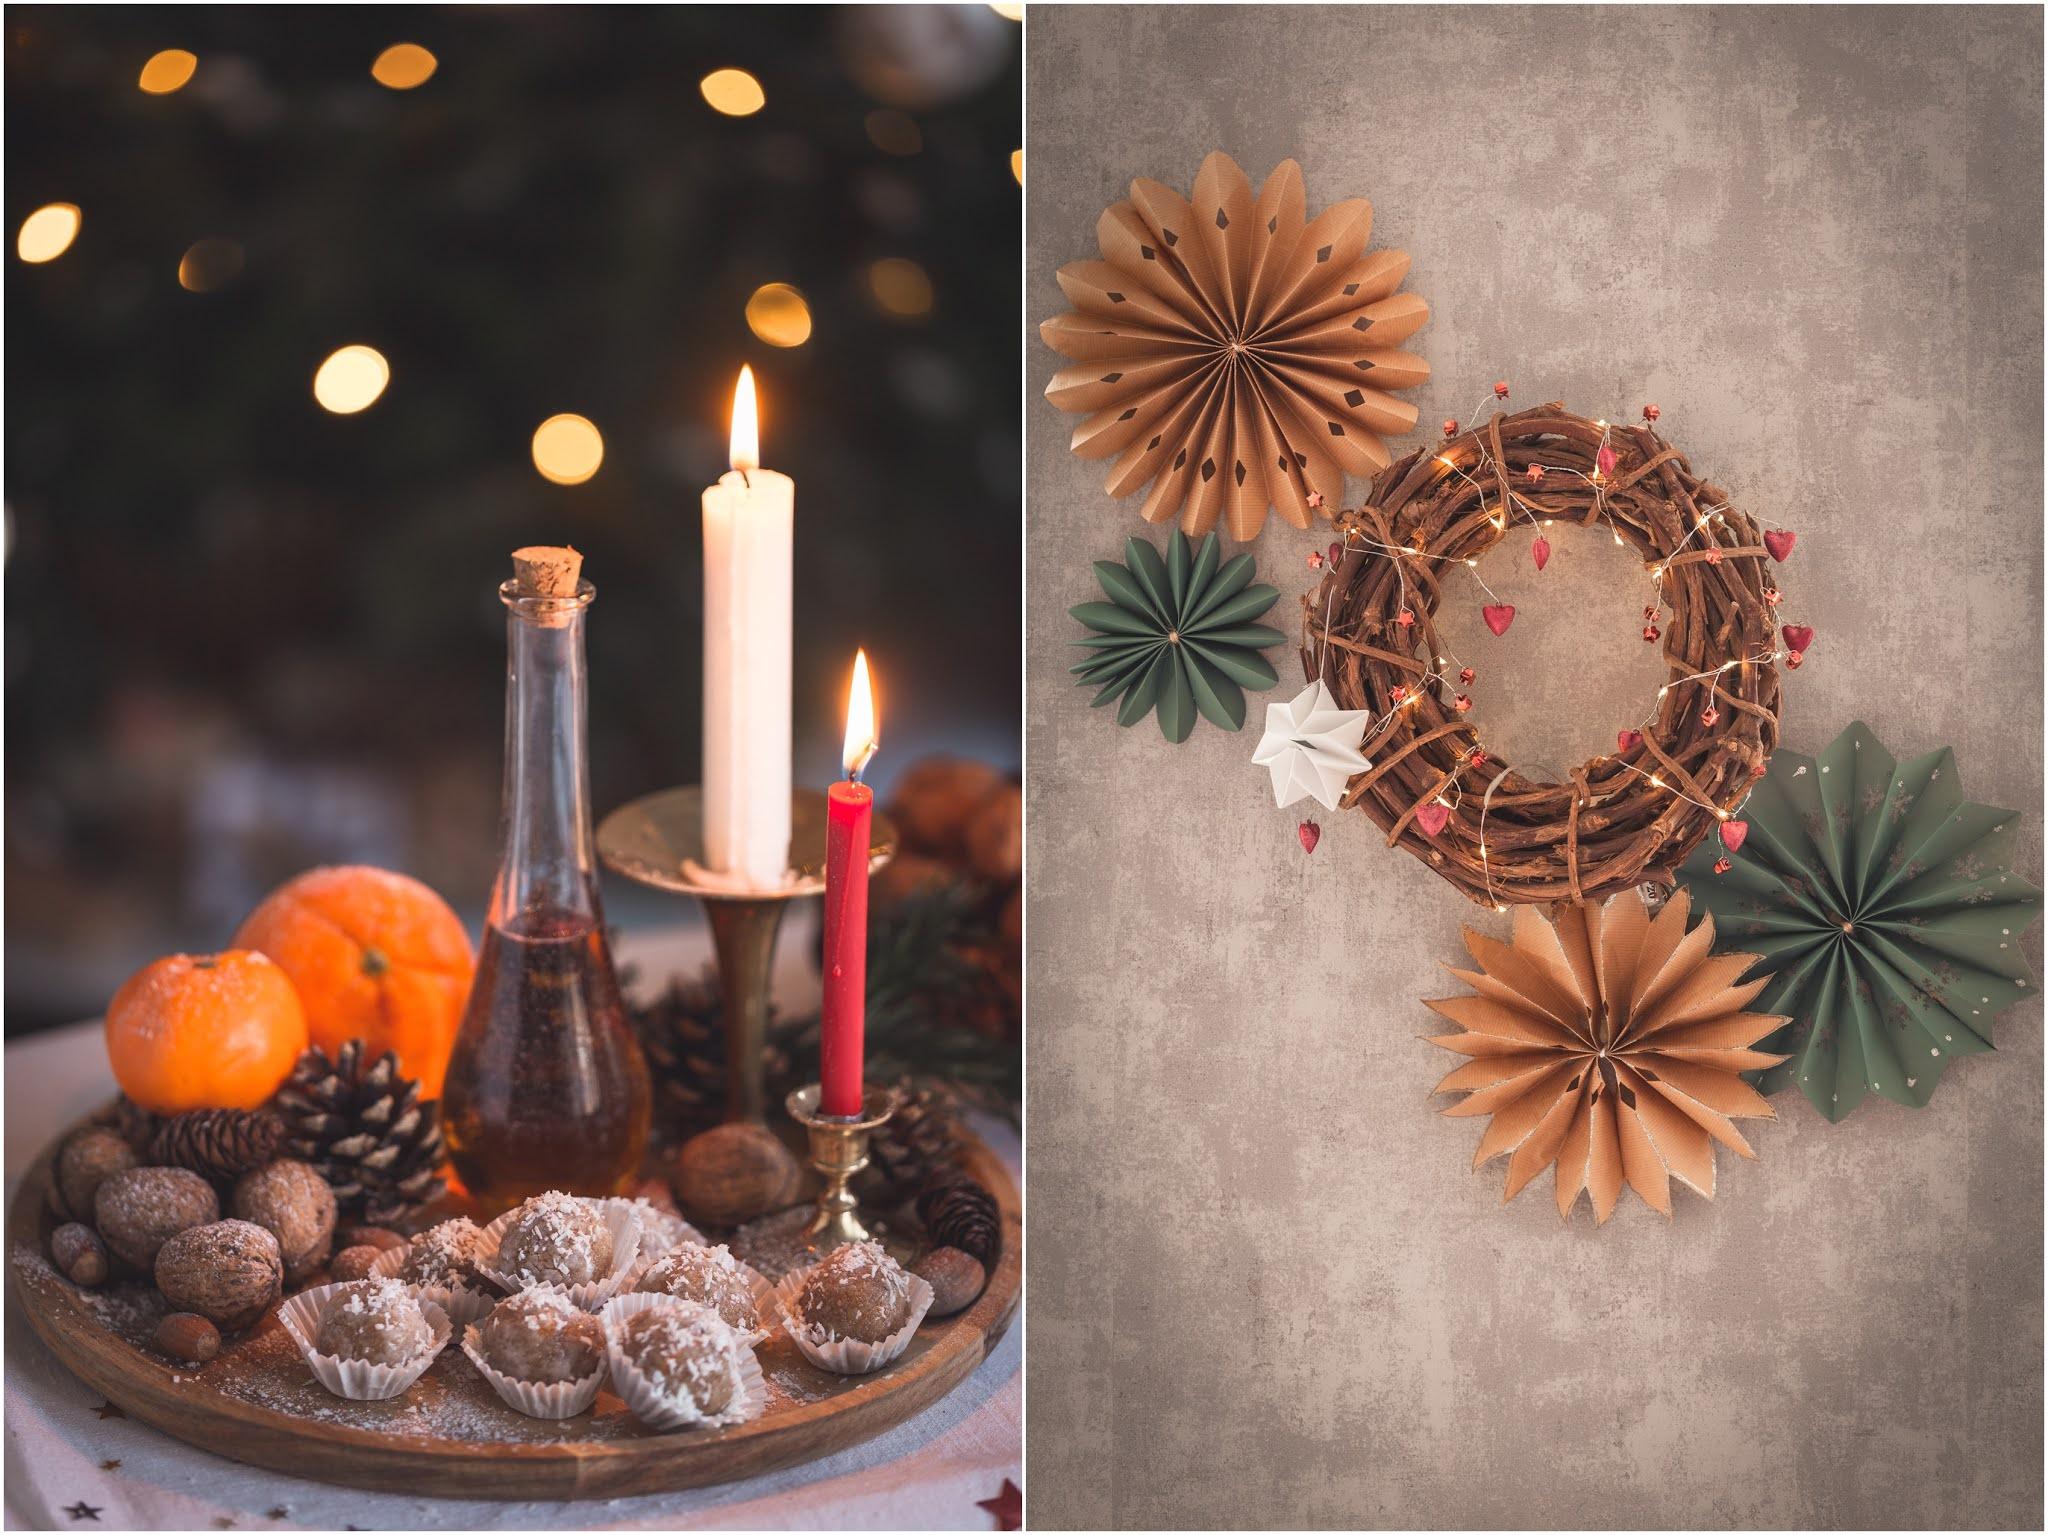 WEEKENDS IN THE KITCHEN: Постни Коледни Сладки без печене (GF& DF)